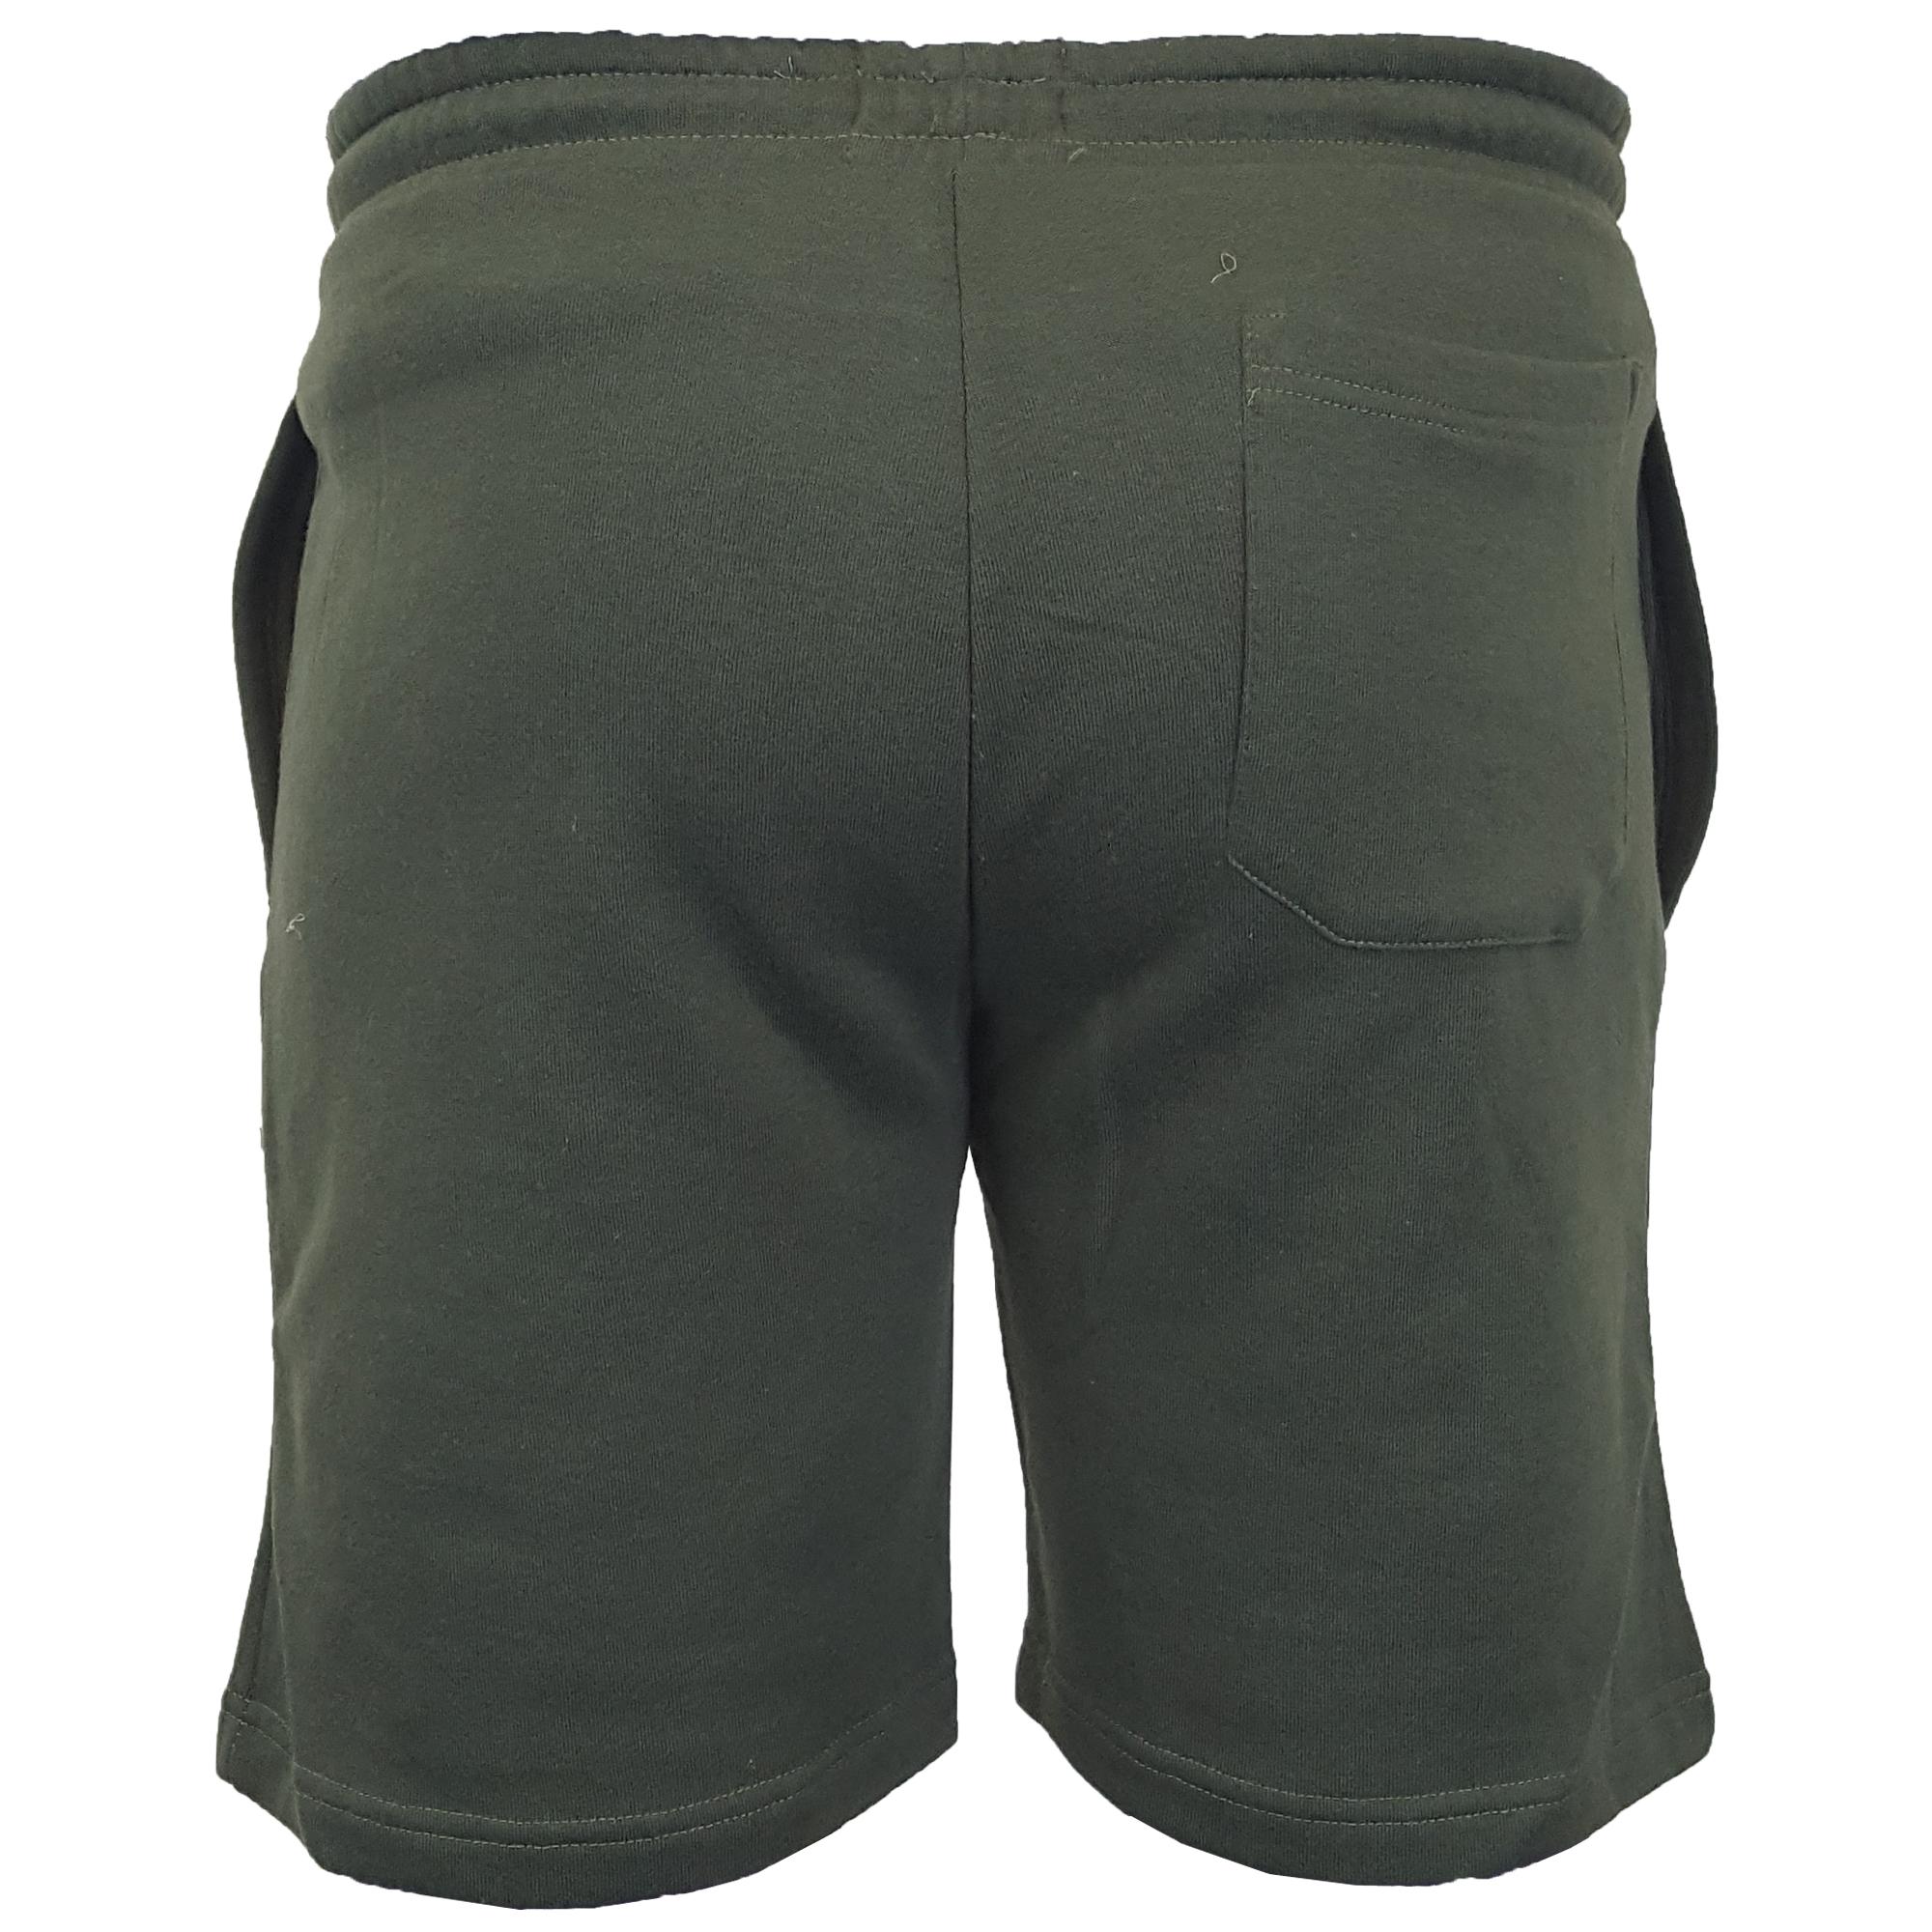 Mens-Jogger-Shorts-Tarley-by-Brave-Soul-Knee-Length-Casual-Fleece-Lined-Summer thumbnail 11